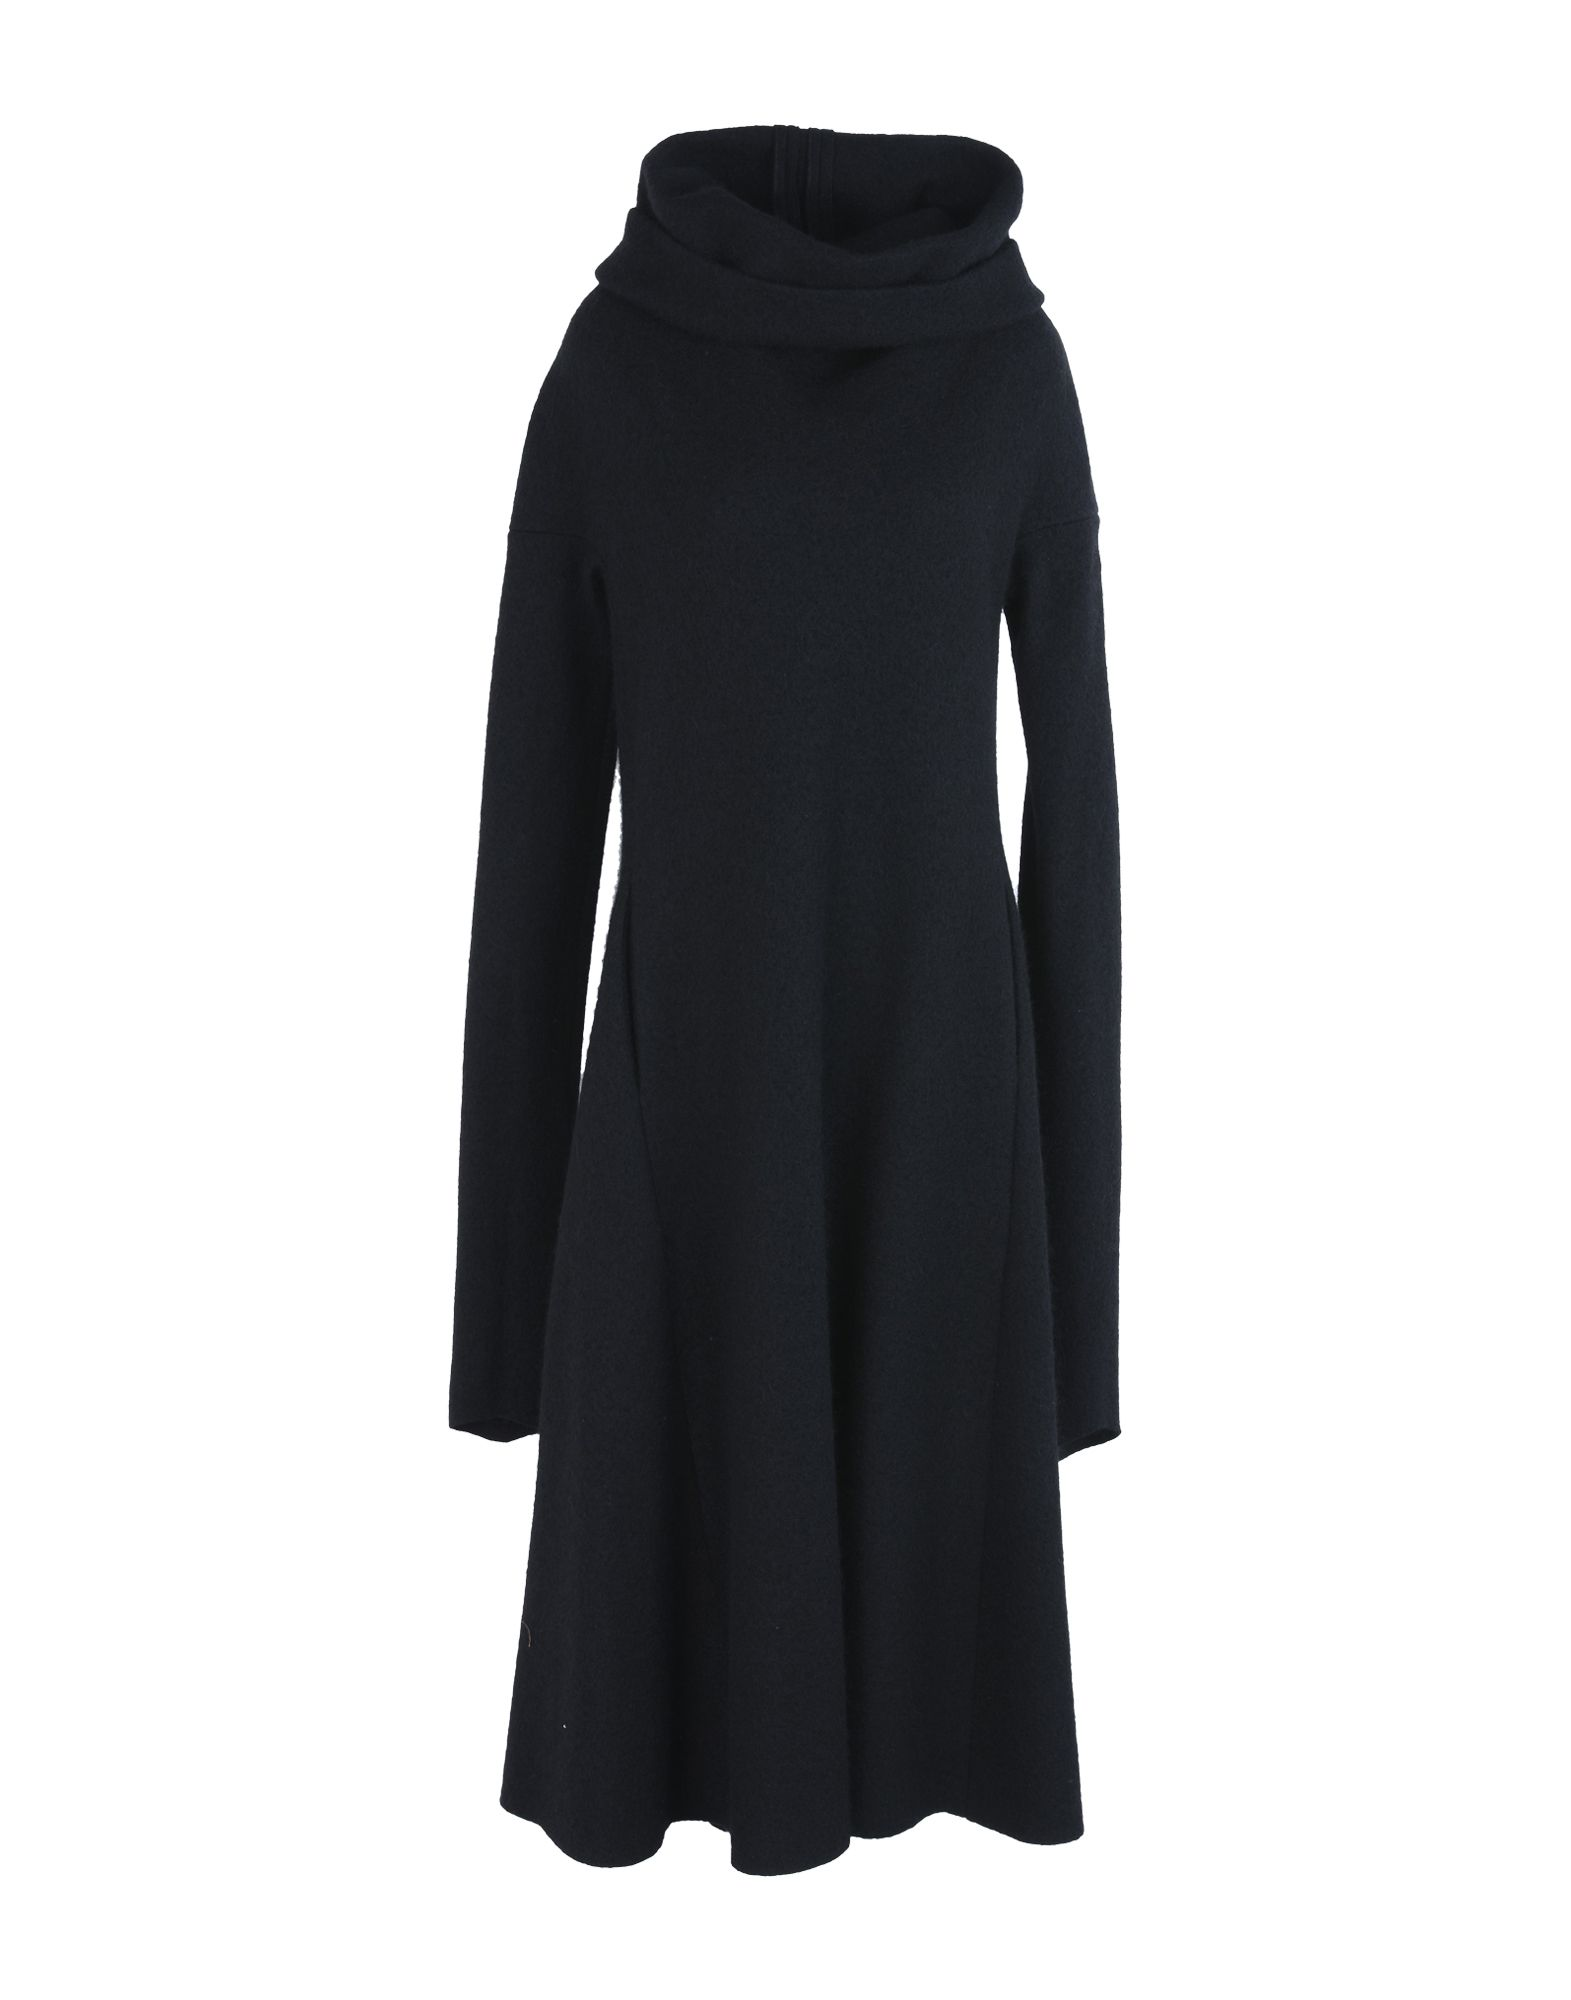 AGANOVICH Платье длиной 3/4 boss bpk 12 d73